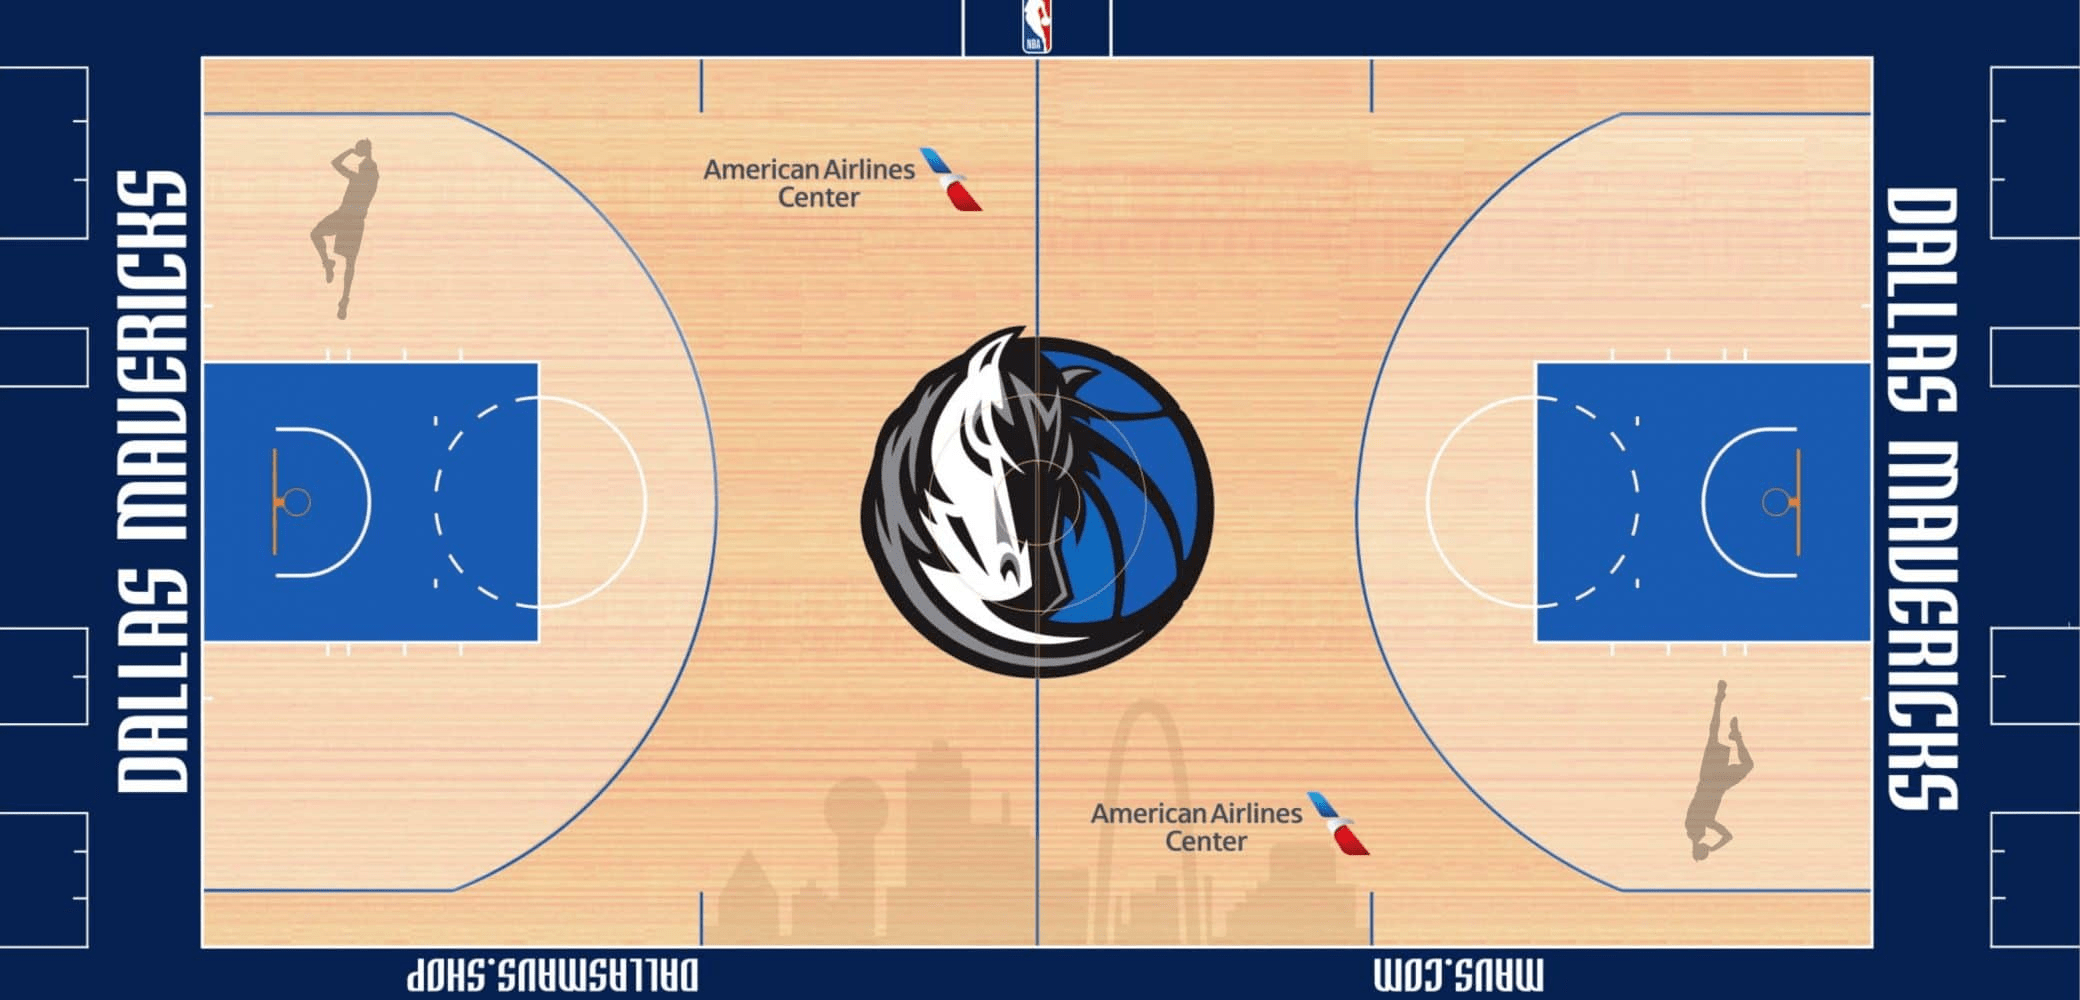 Dallas Mavericks Basketball Wiki